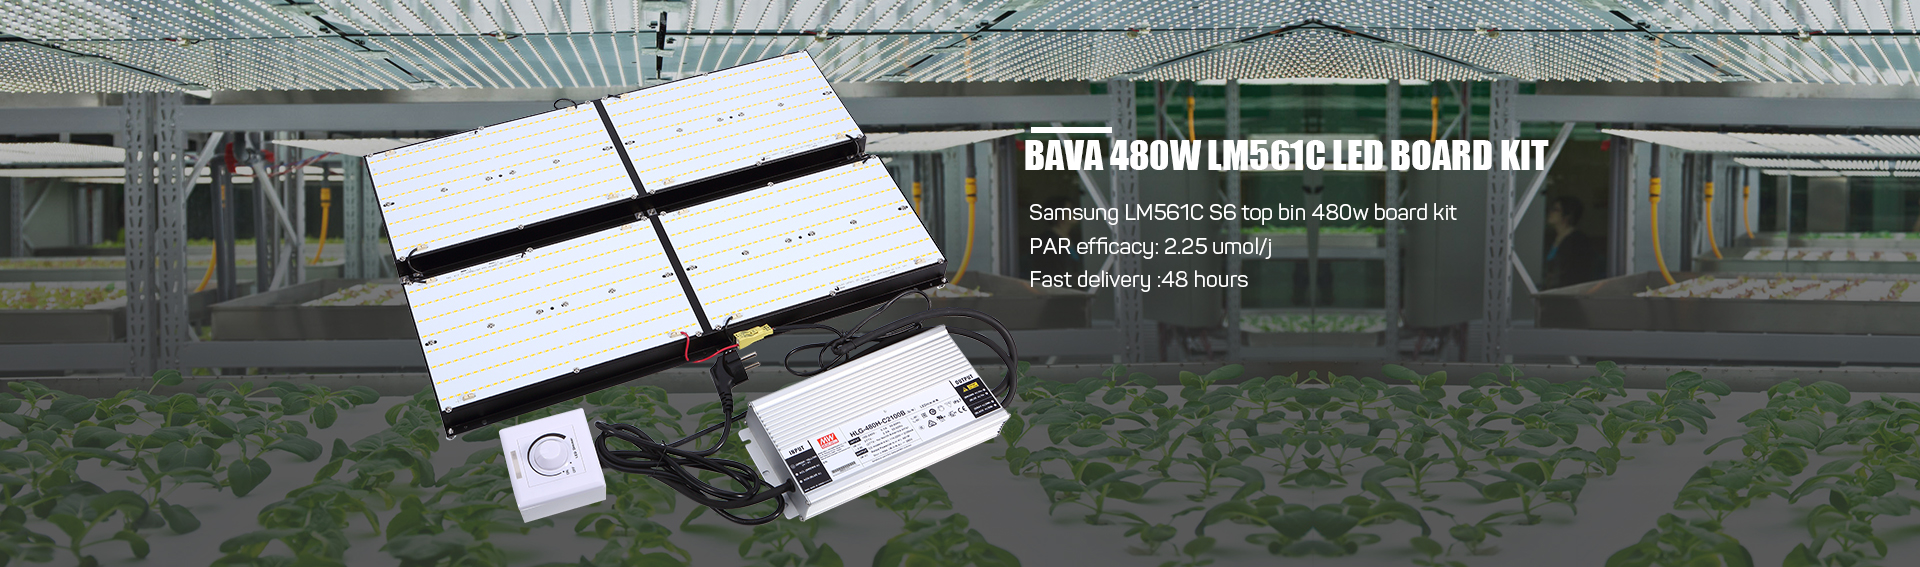 480w Hlg 550 Quantum Board 4x288 Led 3000k 4000k Samsung Lm561c Led Grow  Light Hydroponic - Buy Led Grow Light Hydroponic,Led Quantum Board,Quantum